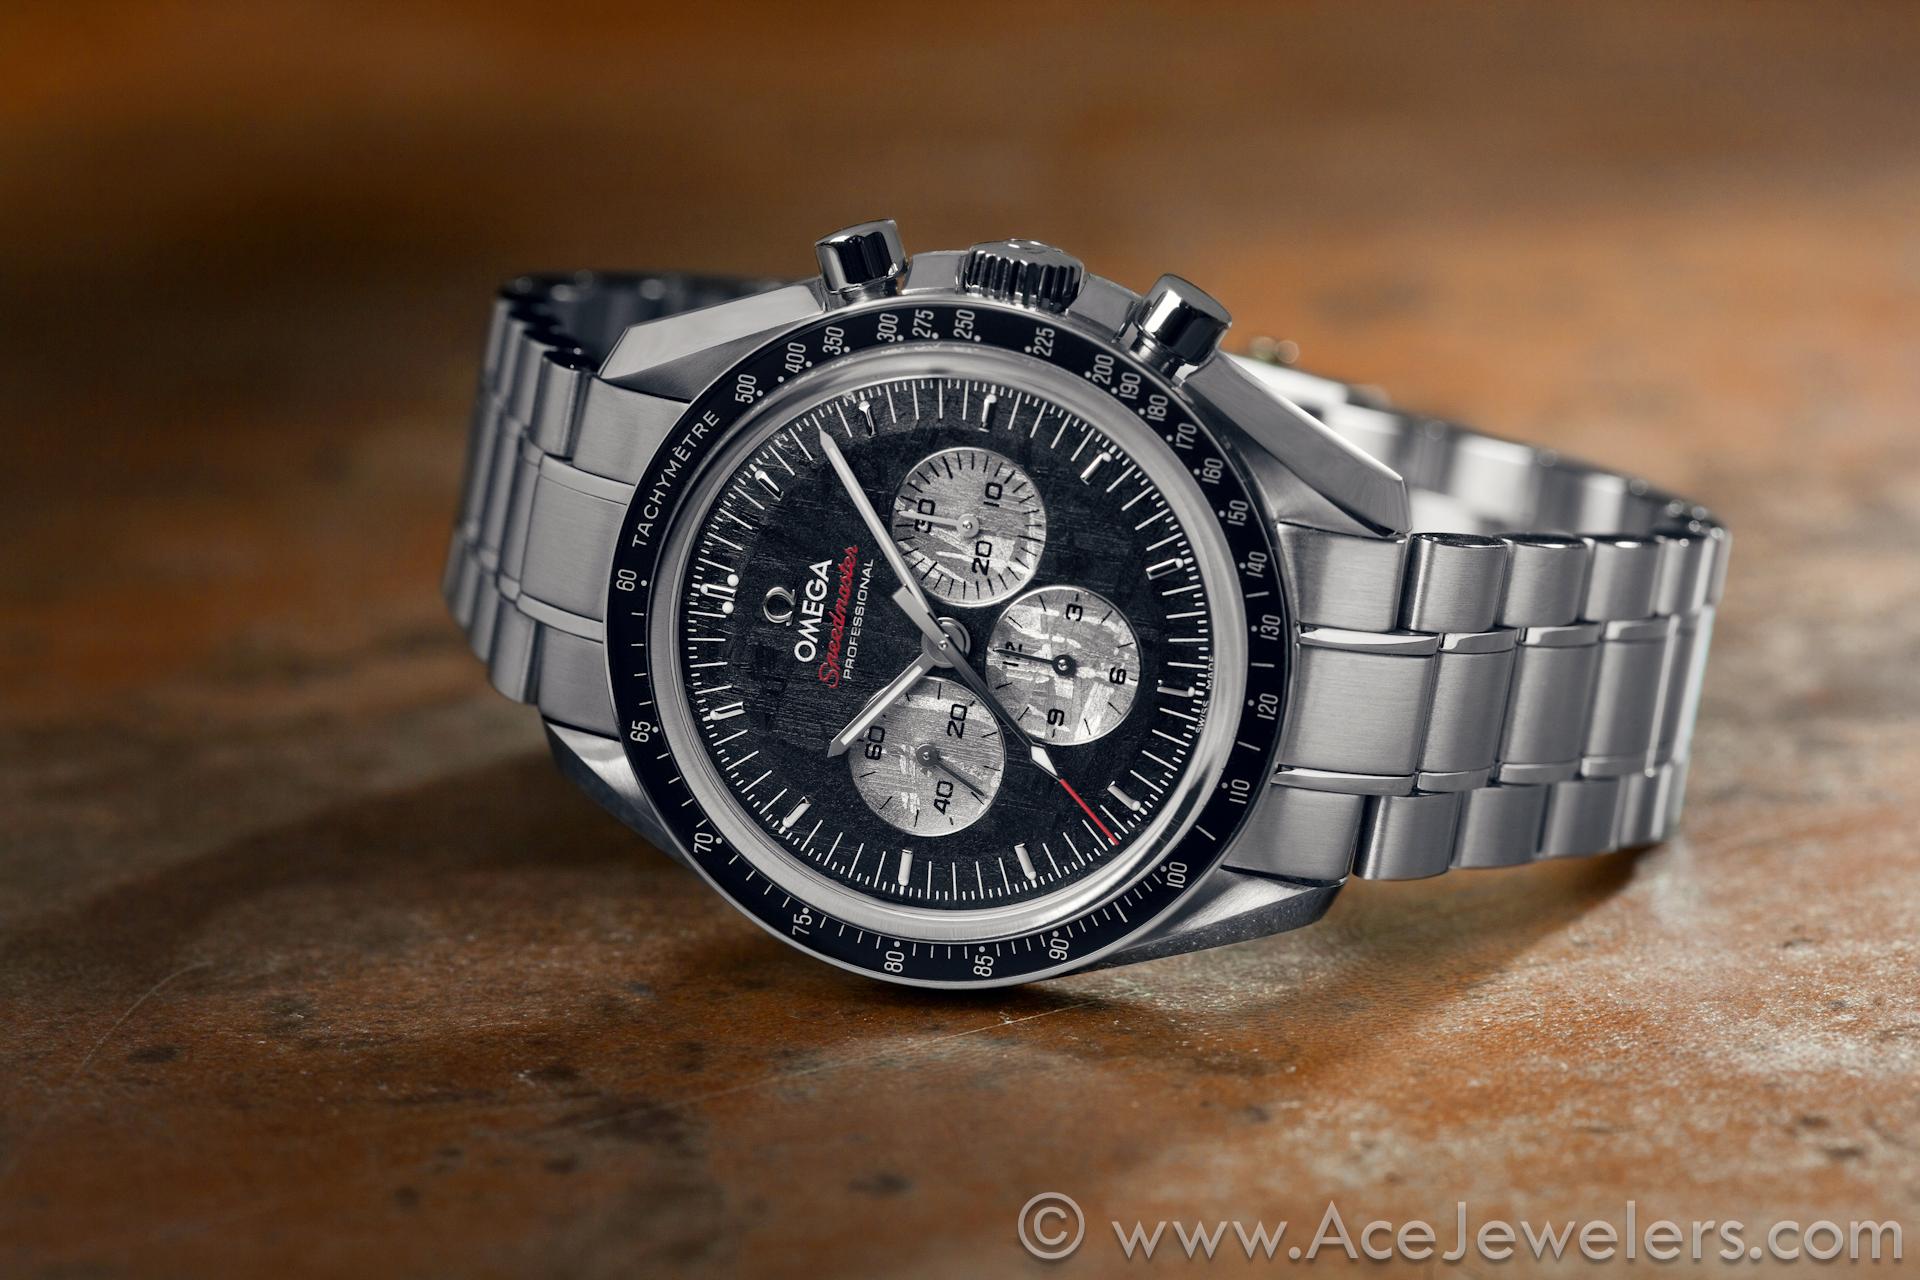 Picture: Omega Speedmaster Professional Apollo-Soyuz - Speedy Watches